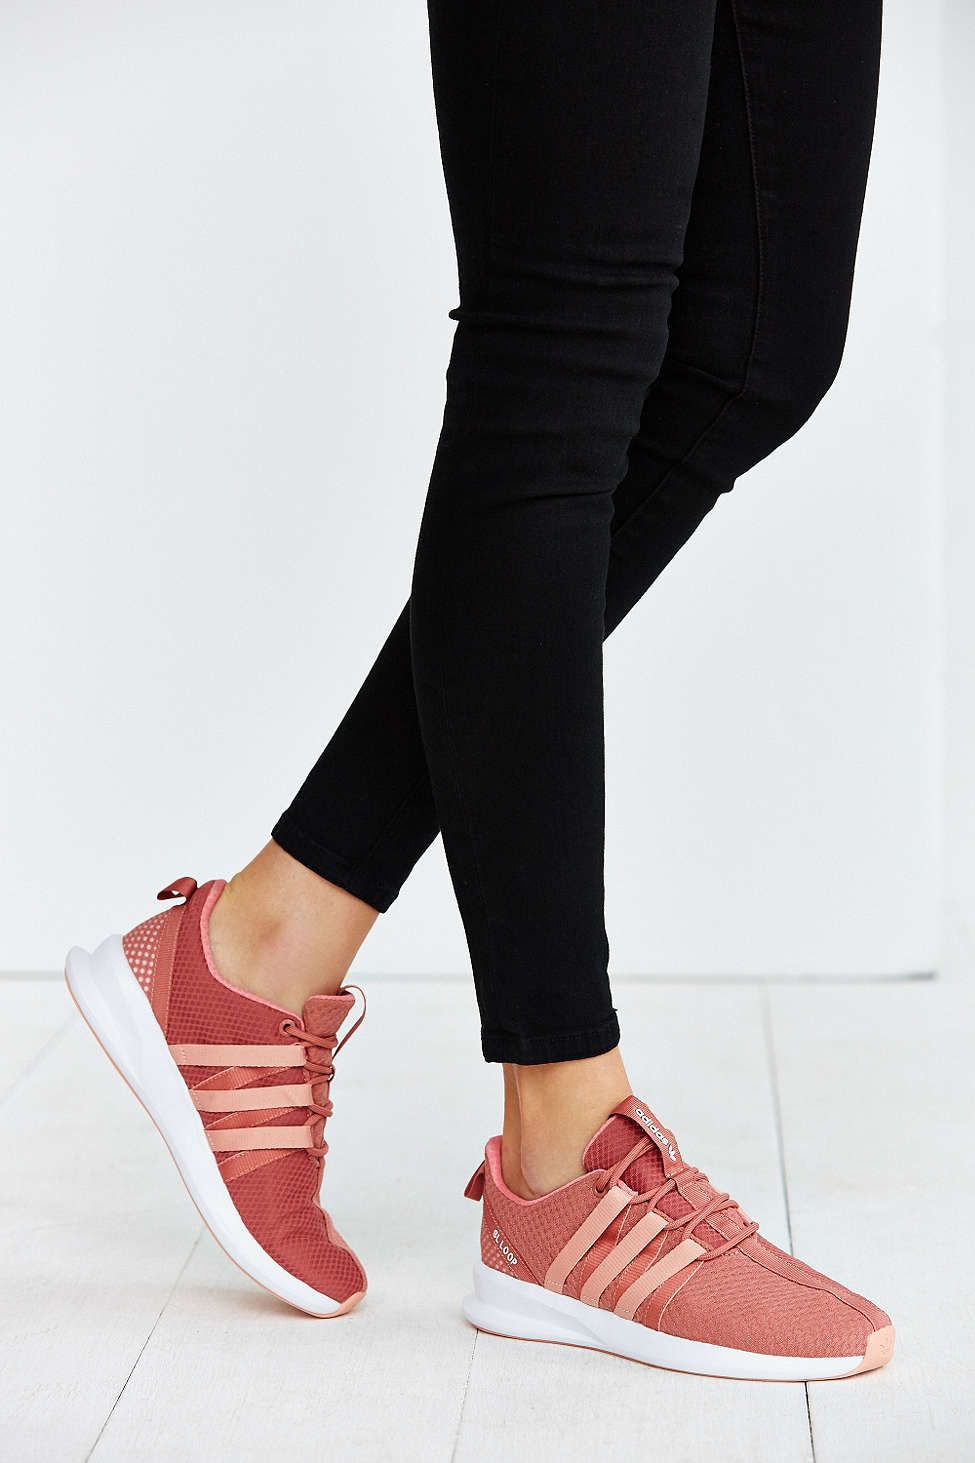 adidas Originals SL Loop Racer Running Sneaker - Urban Outfitters